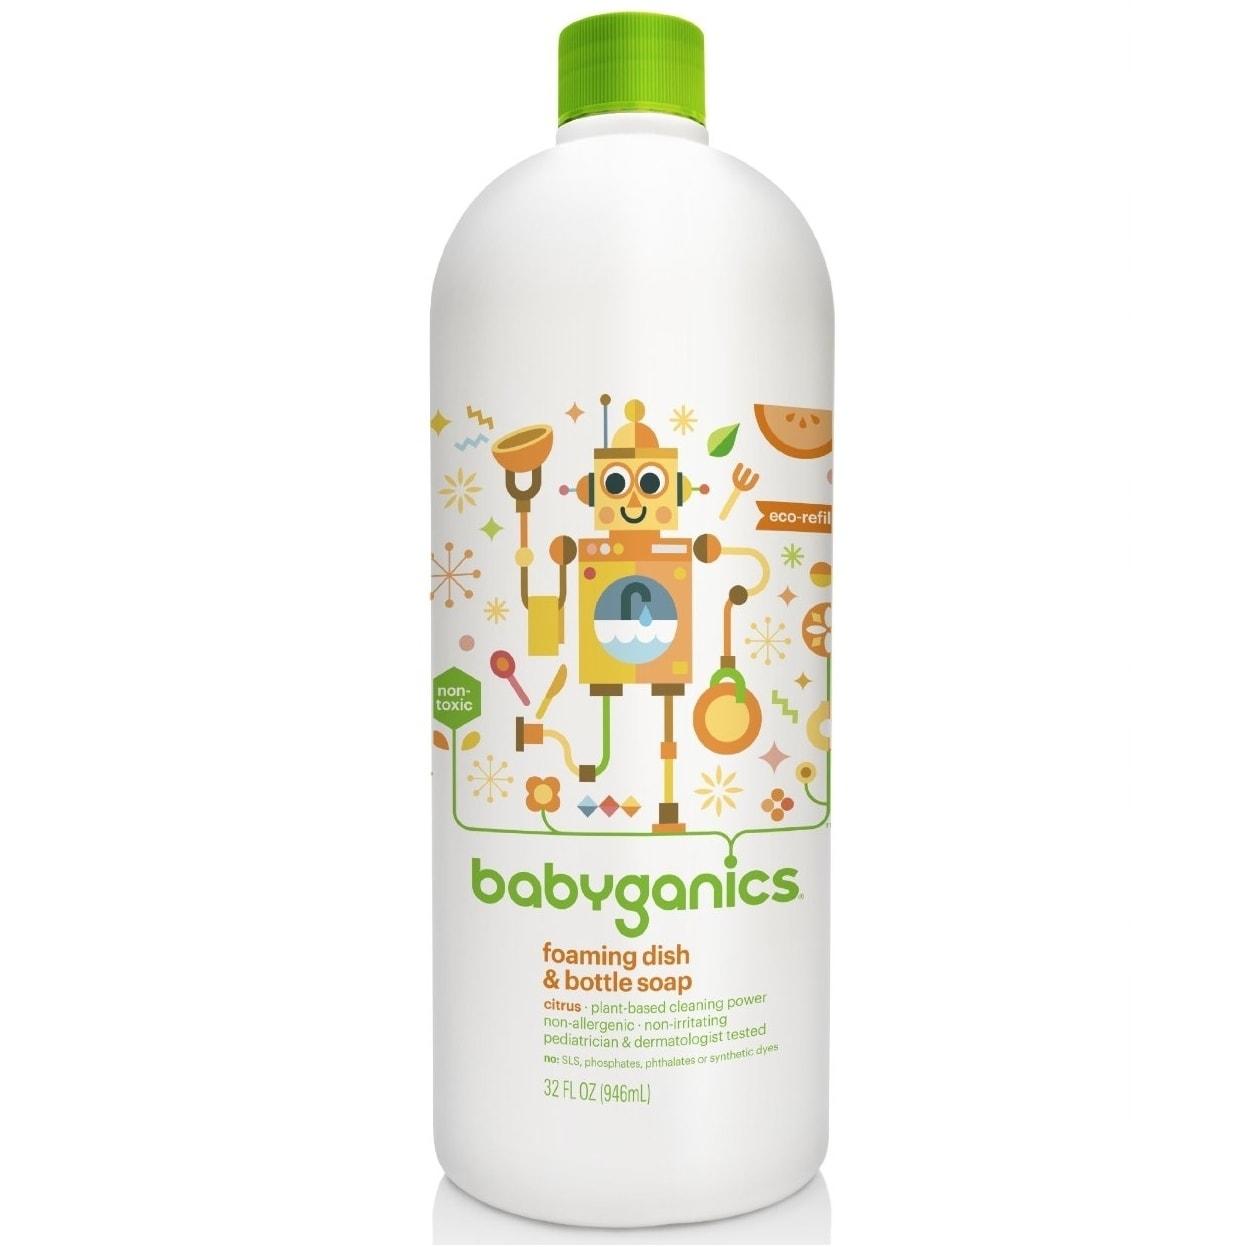 BabyGanics Foaming Dish and Bottle Soap Refill Citrus - 3...